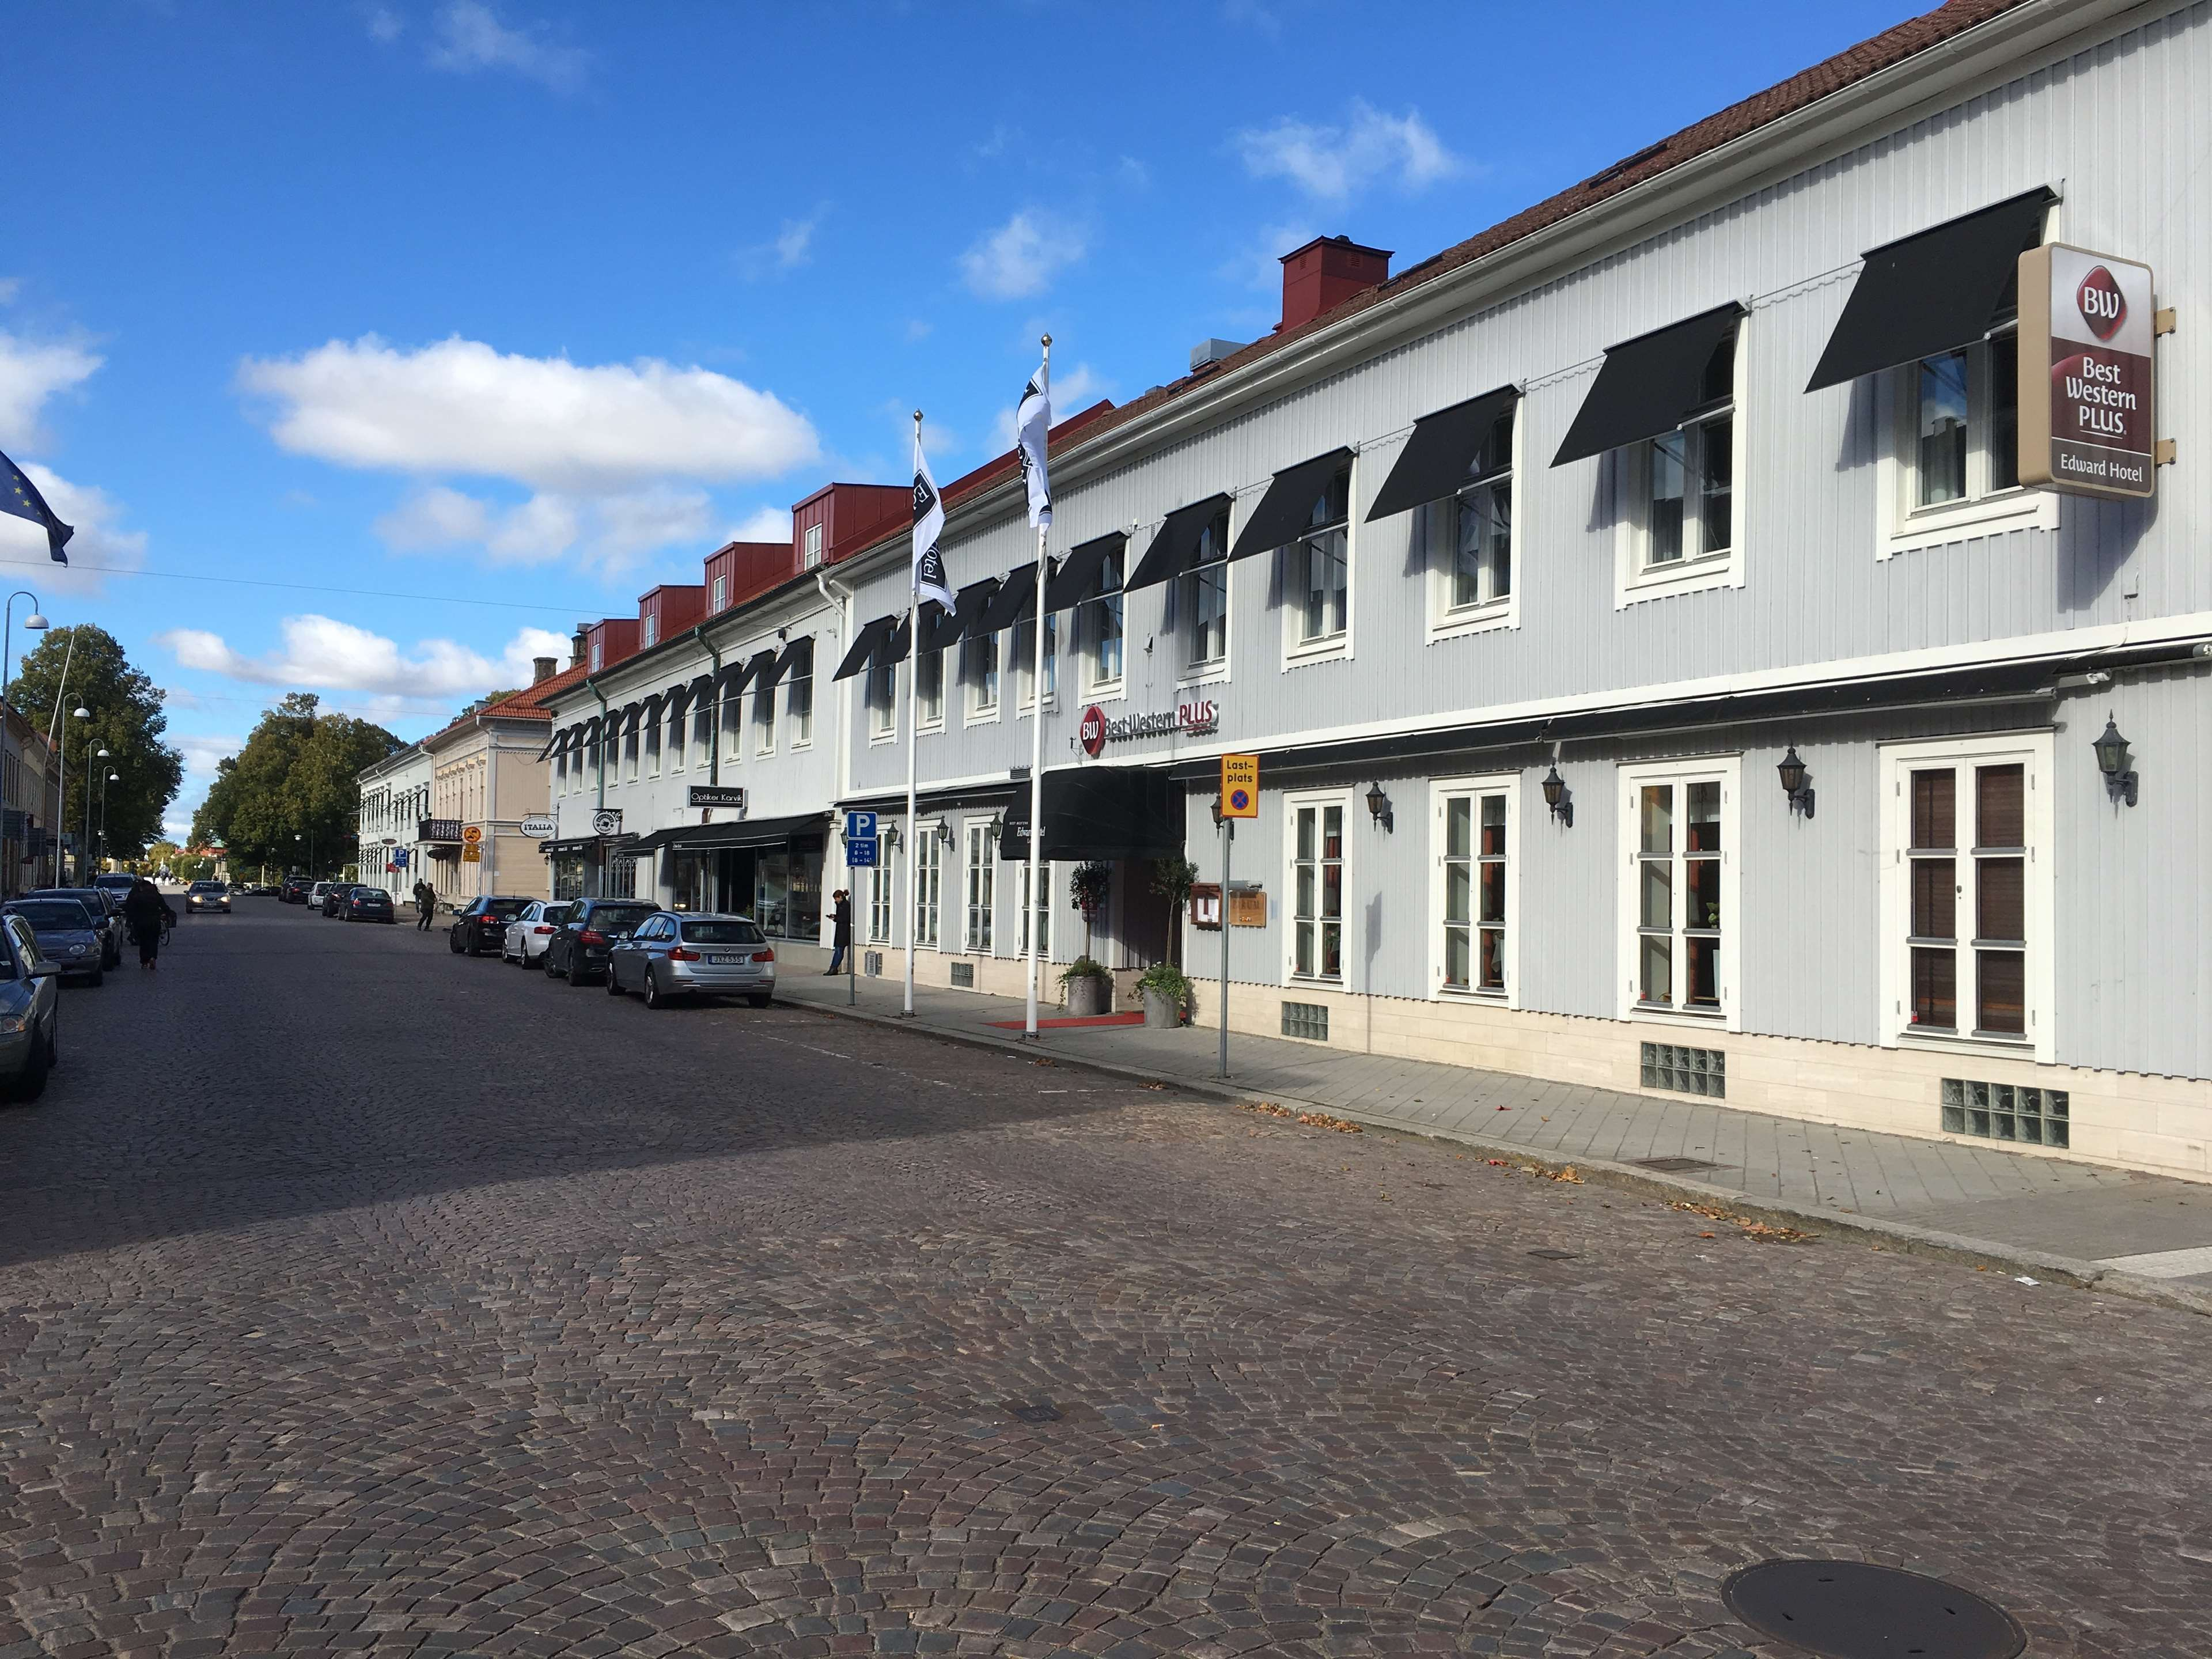 Best Western Plus® Edward Hotel